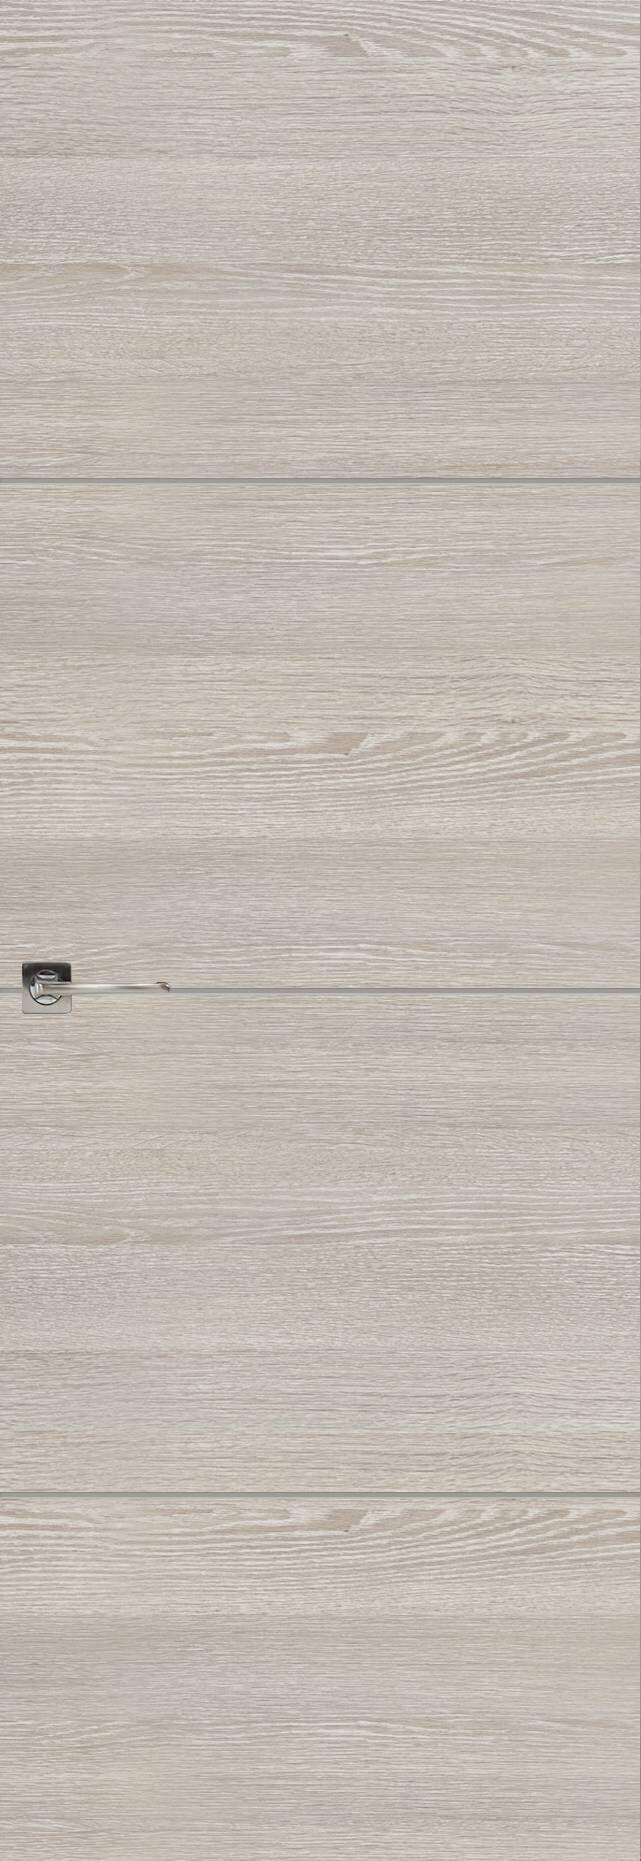 Tivoli Г-2 Невидимка цвет - Серый дуб Без стекла (ДГ)